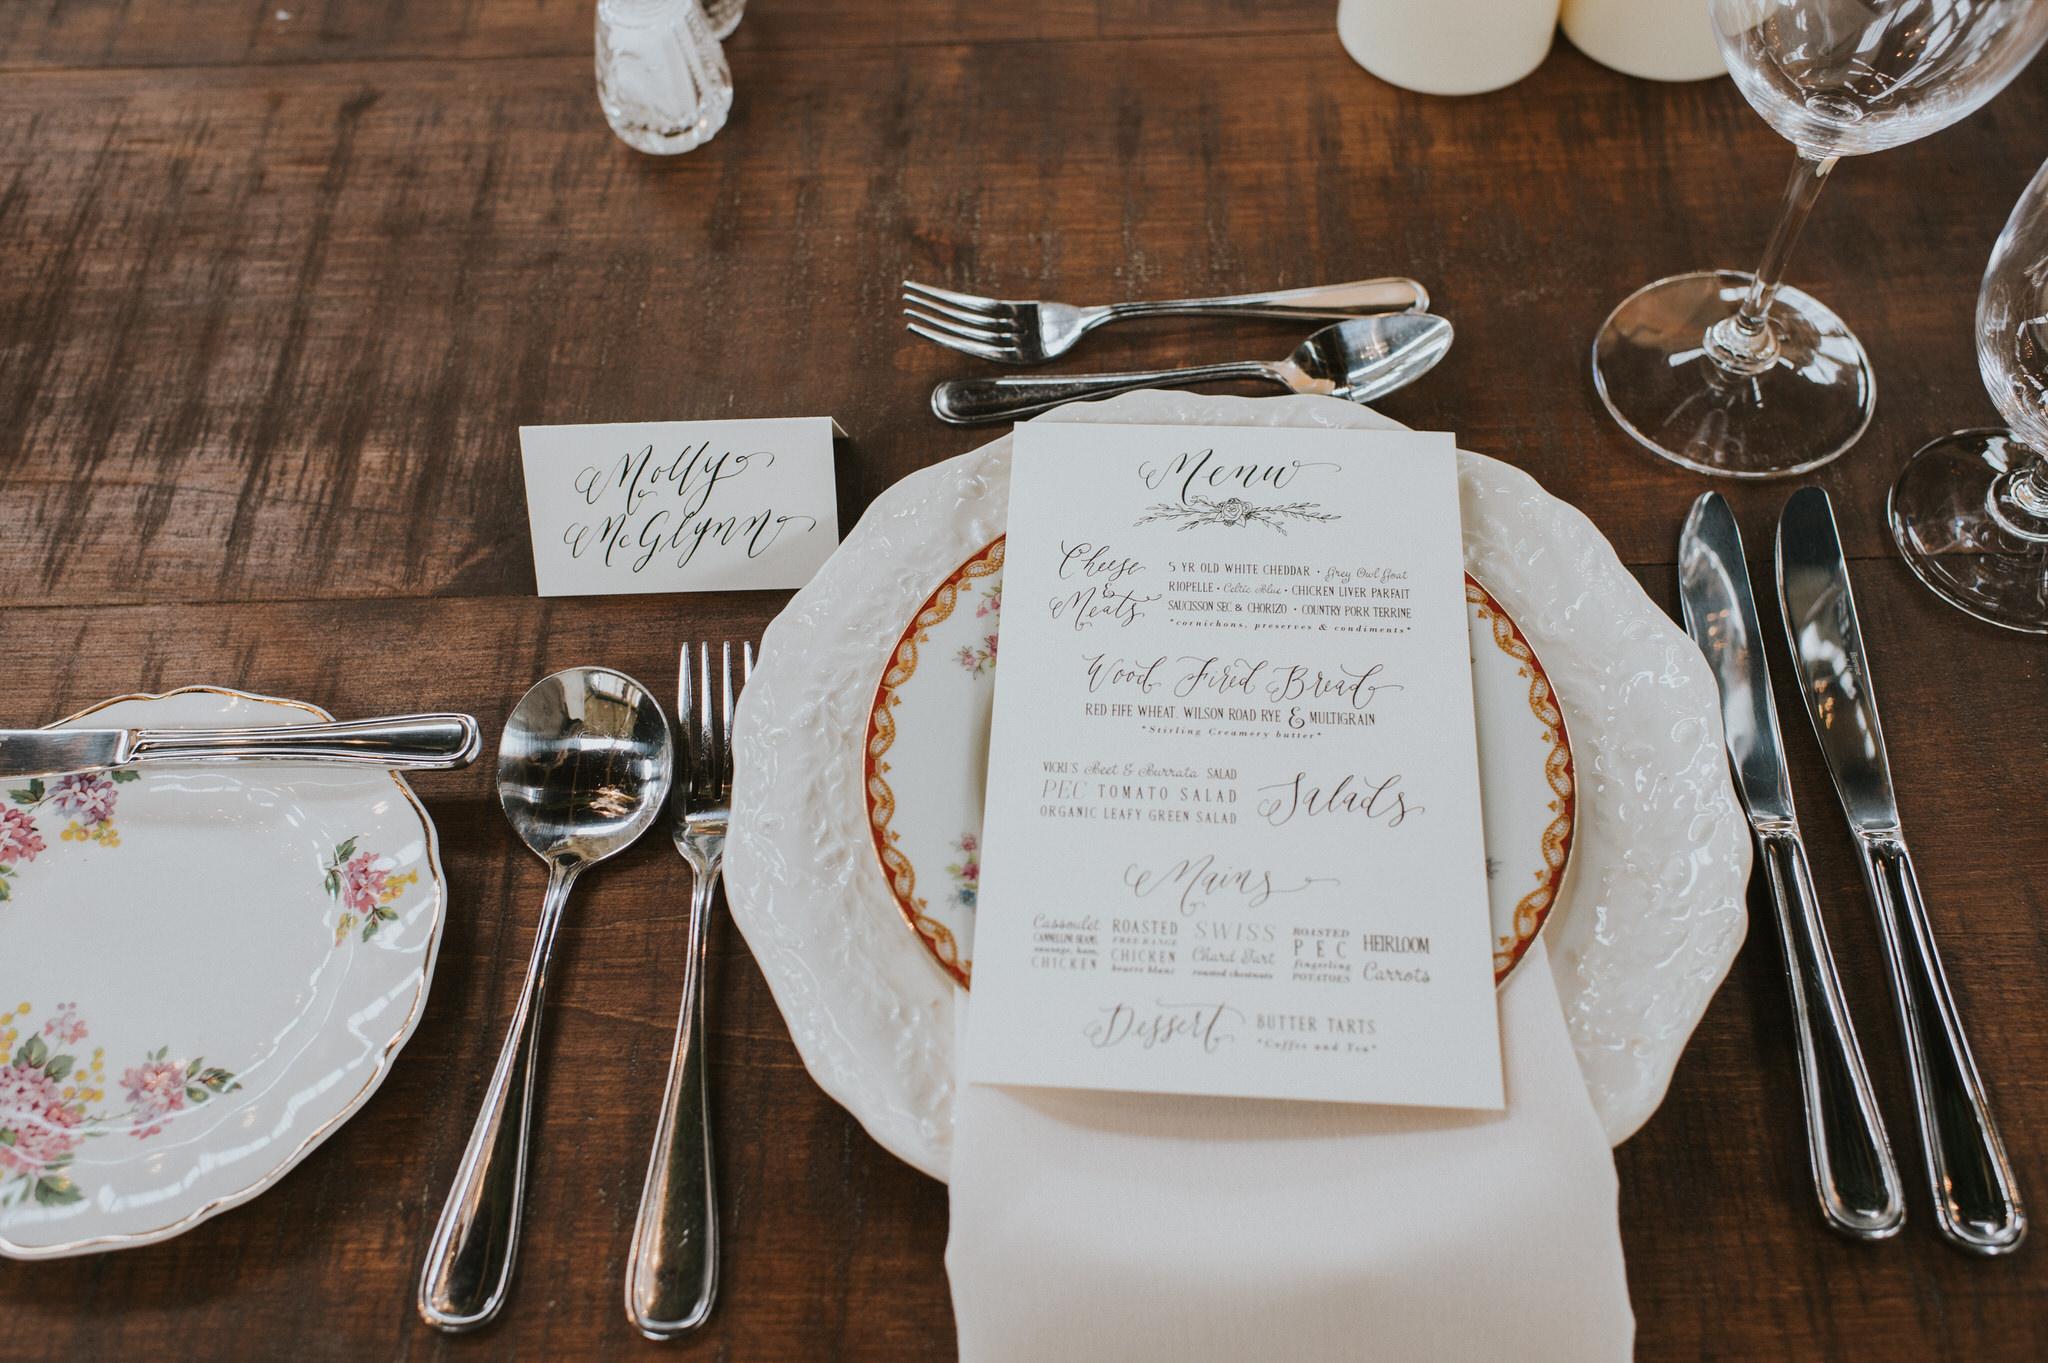 scarletoneillphotography_weddingphotography_prince edward county weddings092.JPG